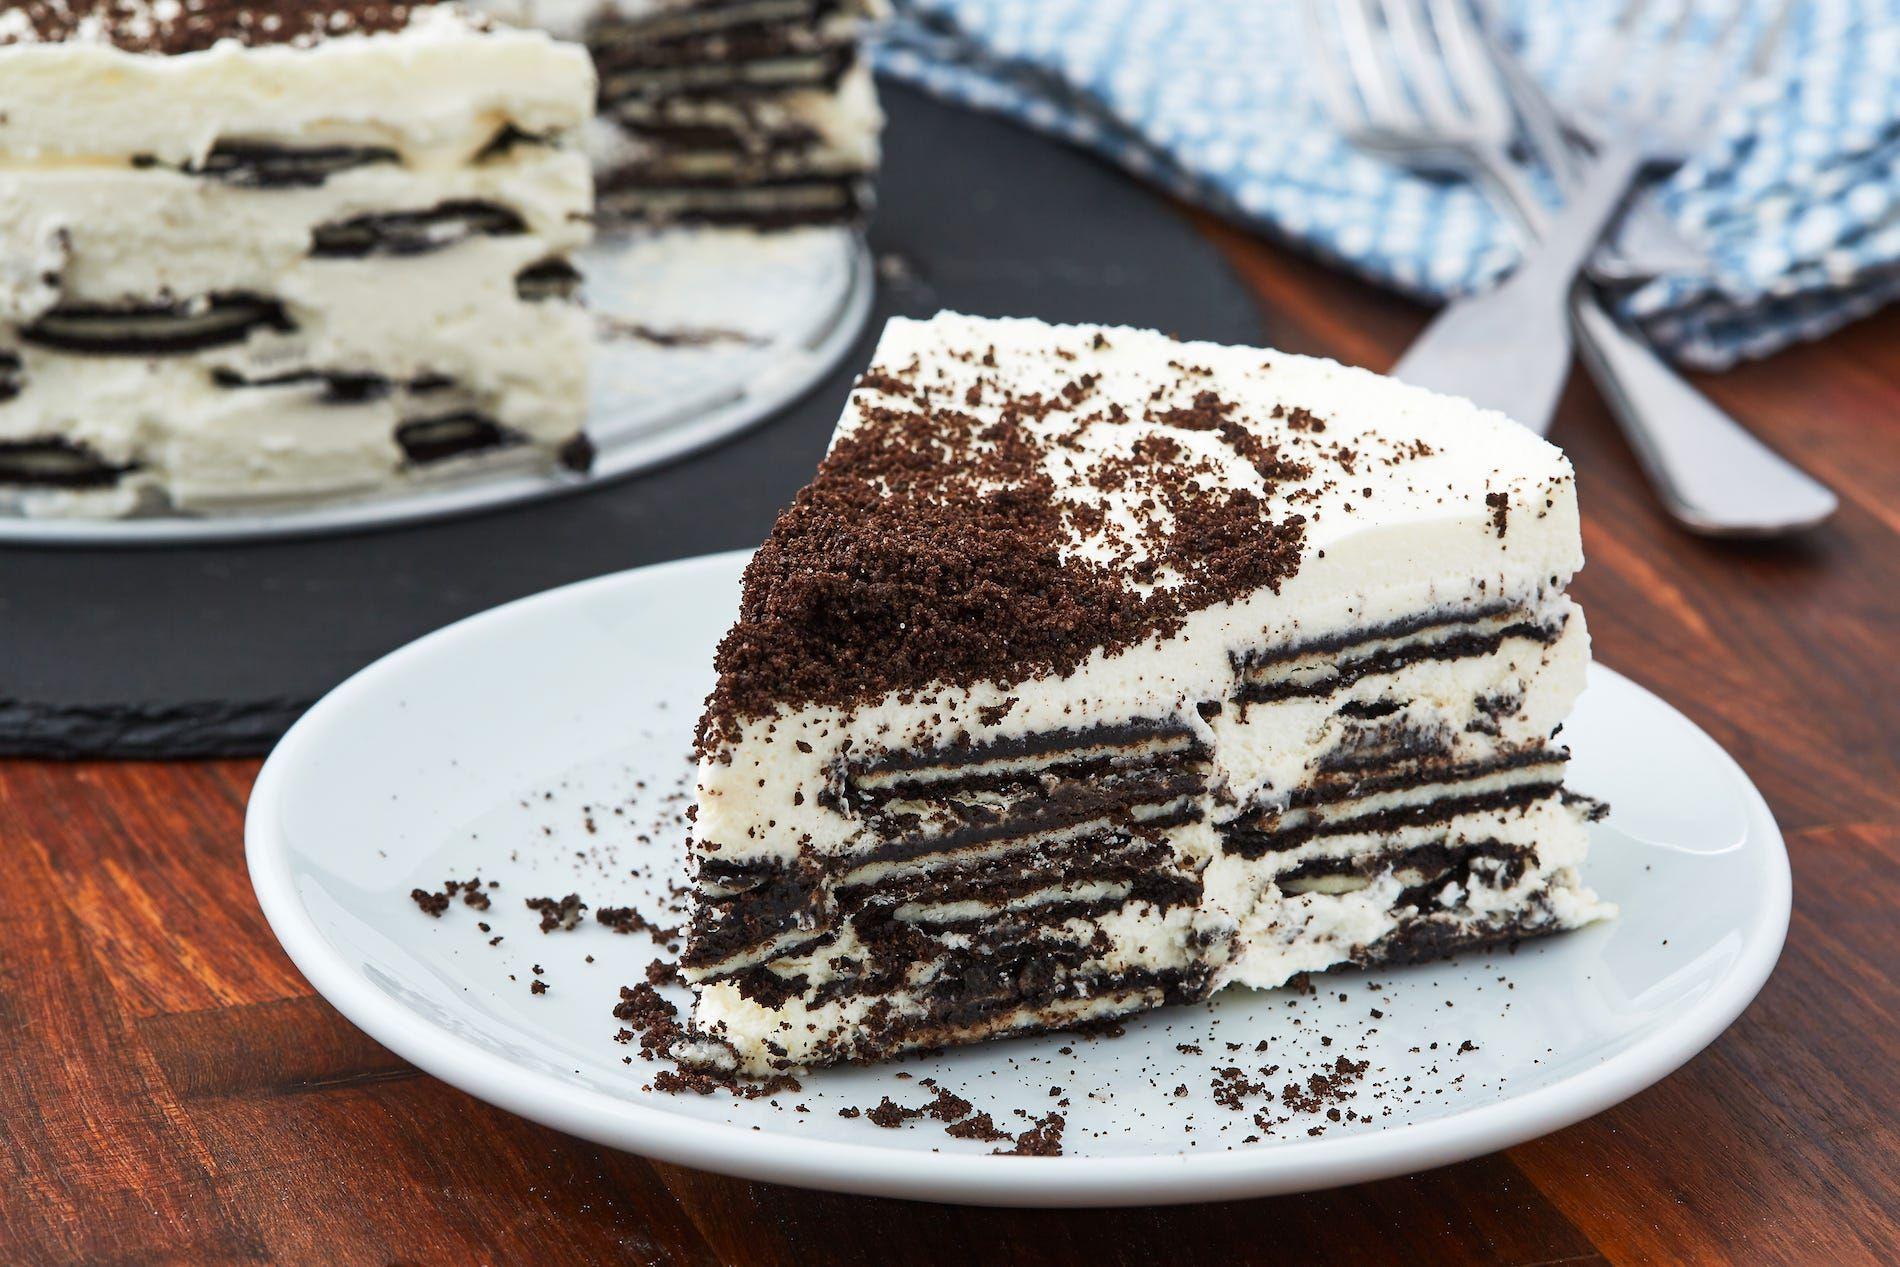 Icebox Cake Recipe - How To Make An Icebox Cake